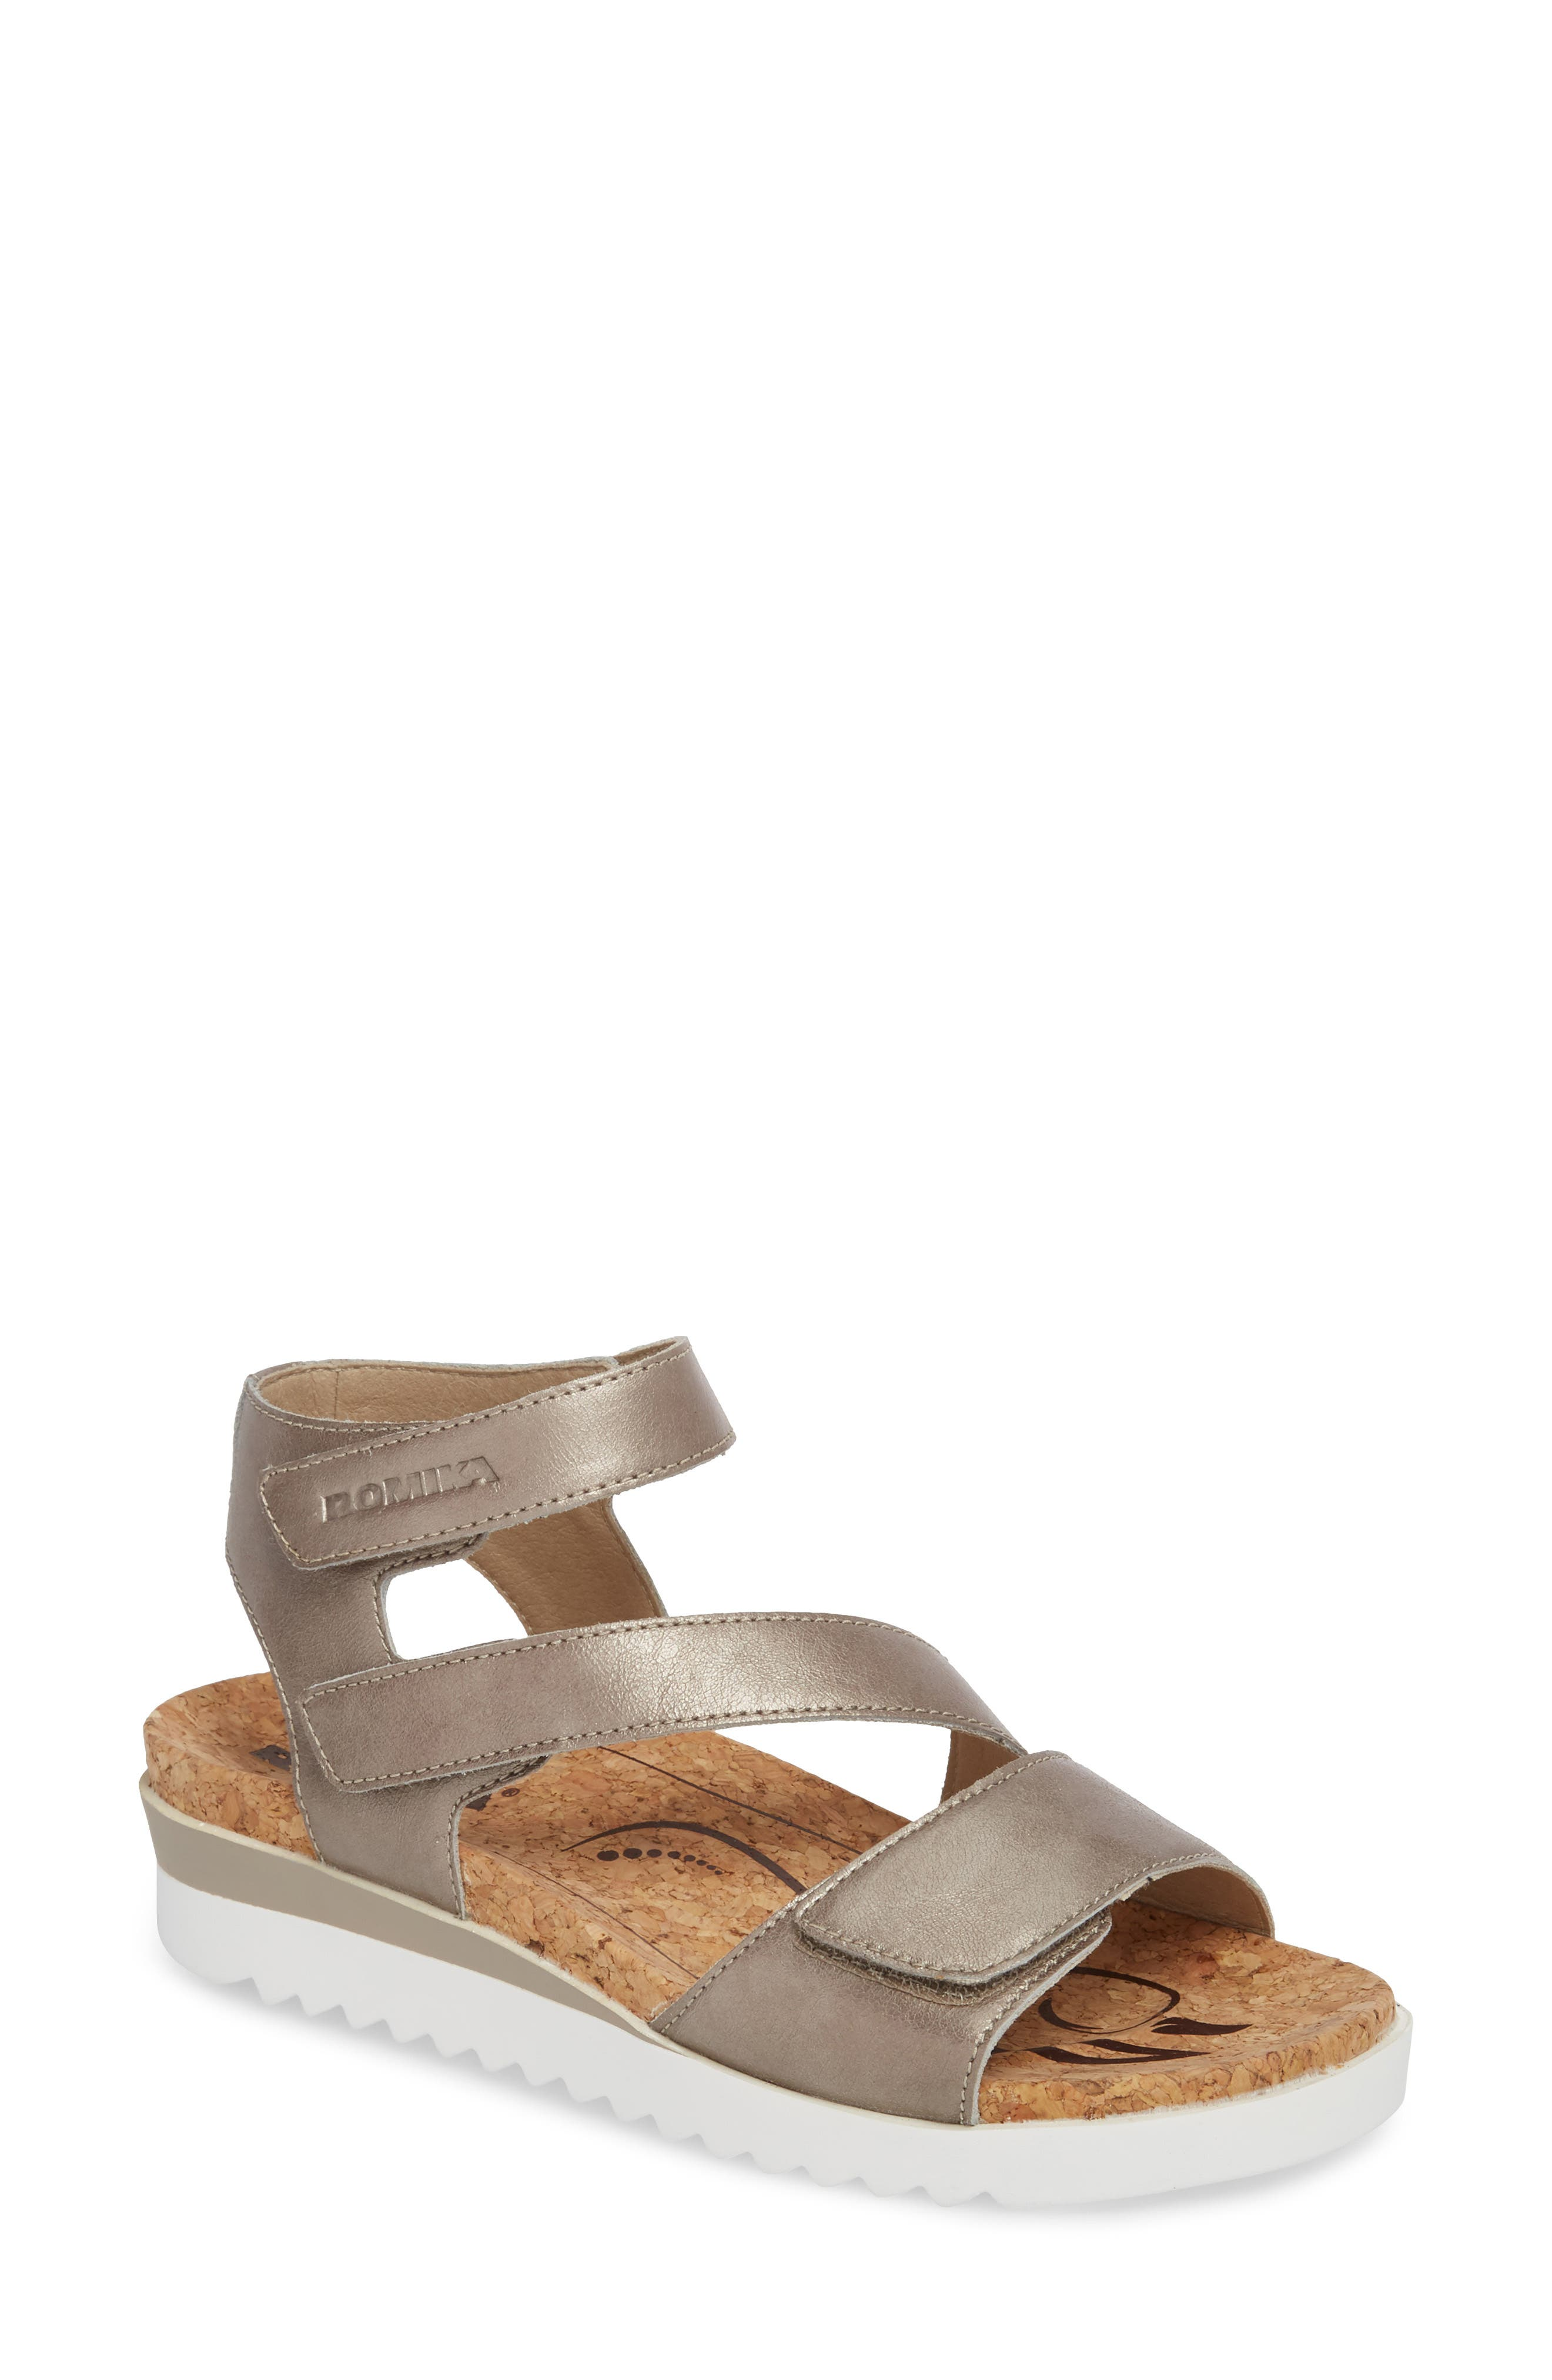 Hollywood 04 Sandal,                         Main,                         color, Platinum Leather